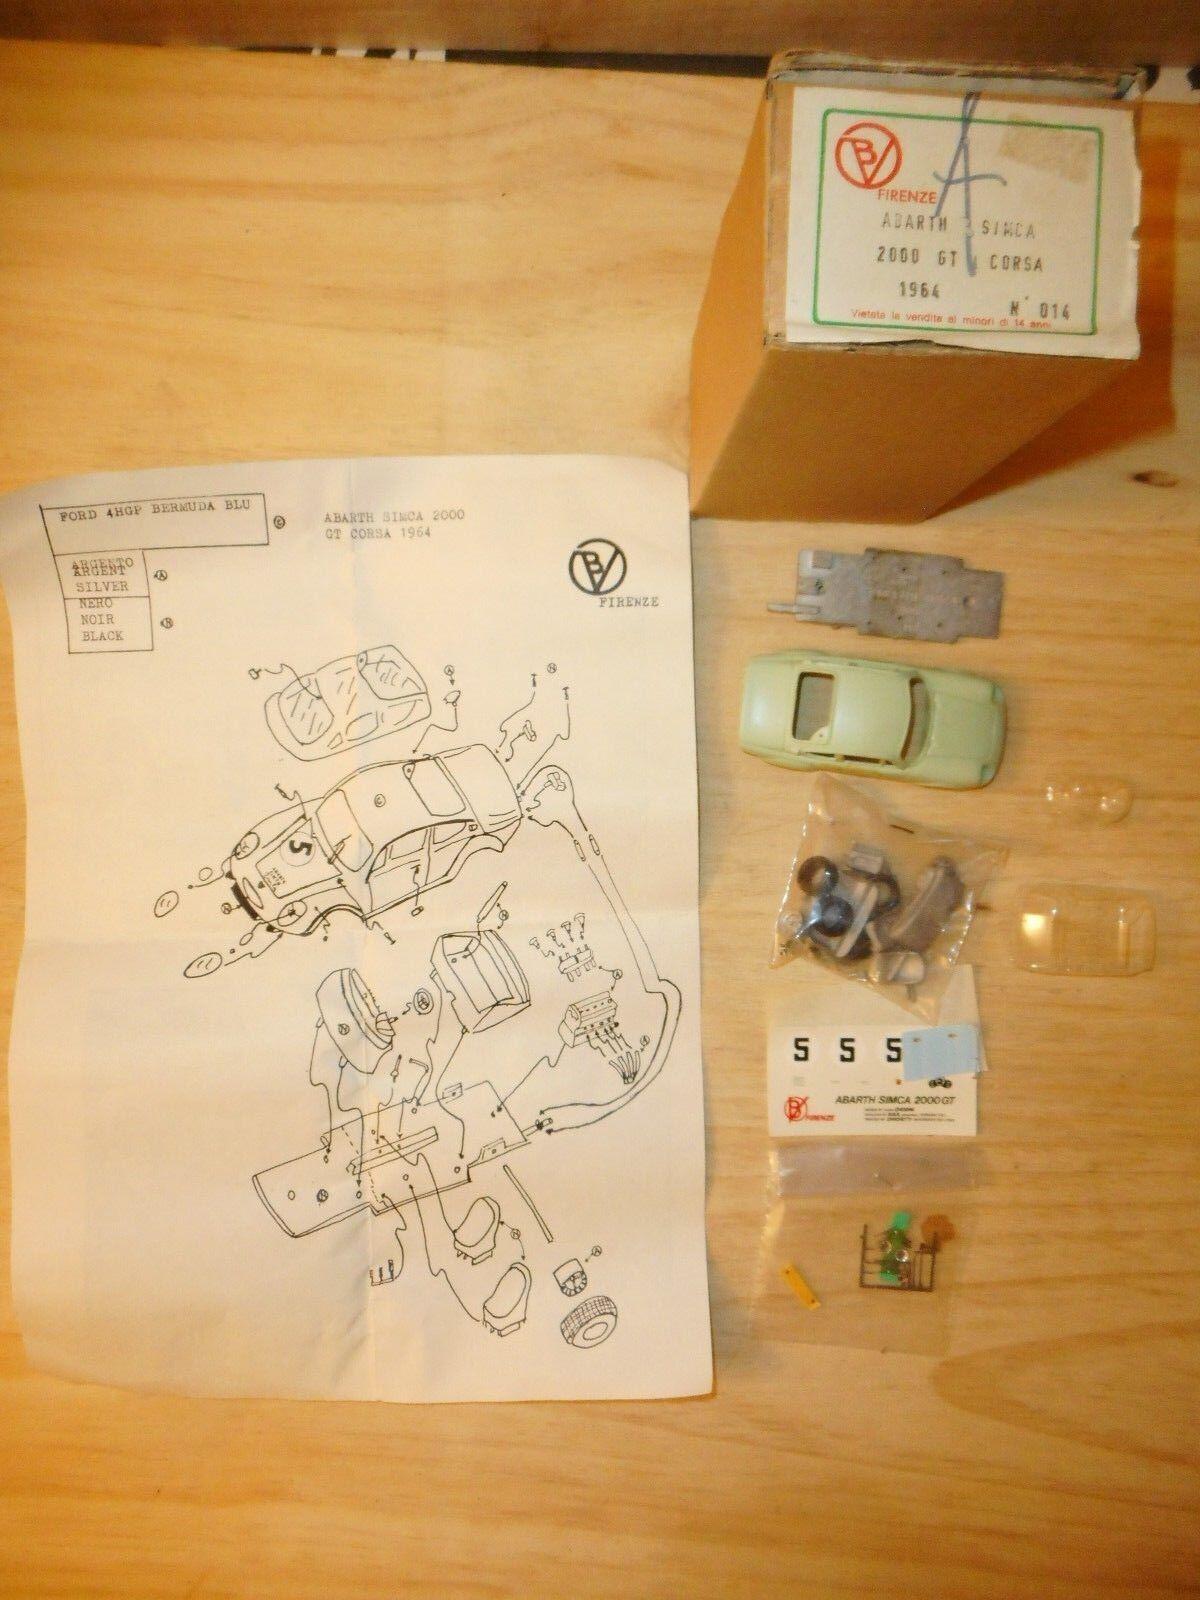 V b firenze barth simca 2000 gt corsa 1964 vintage  kit 1 43  prix plancher